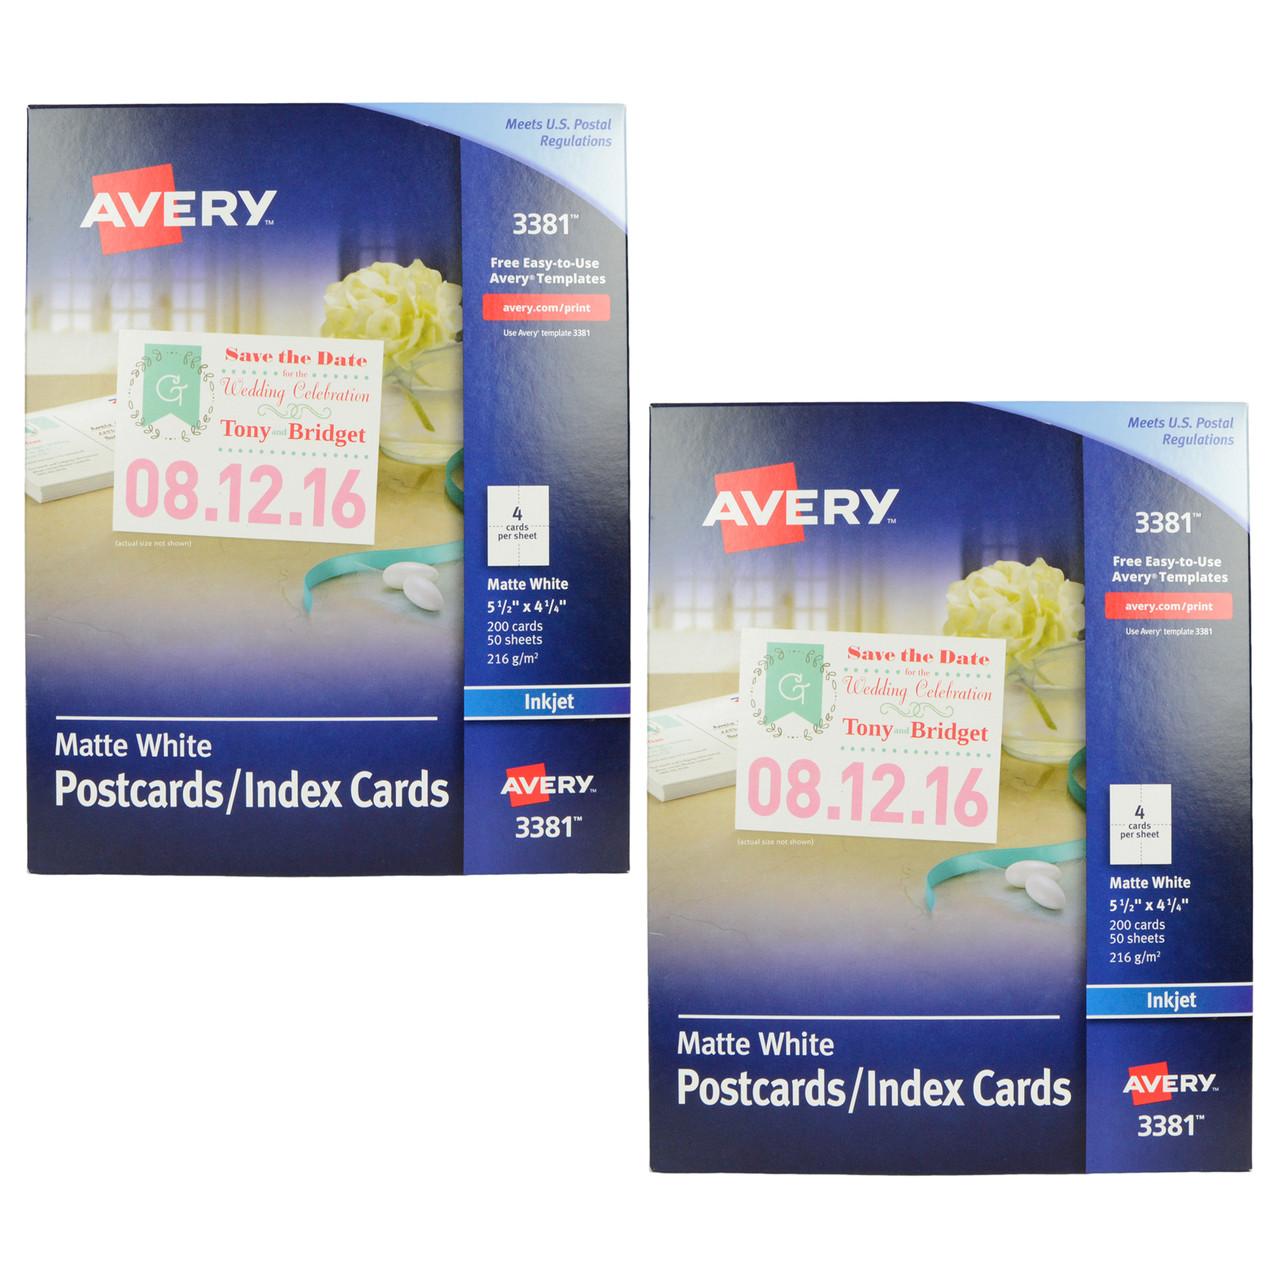 Avery 3381 Inkjet Postcard / Index Cards Bundle Office Items